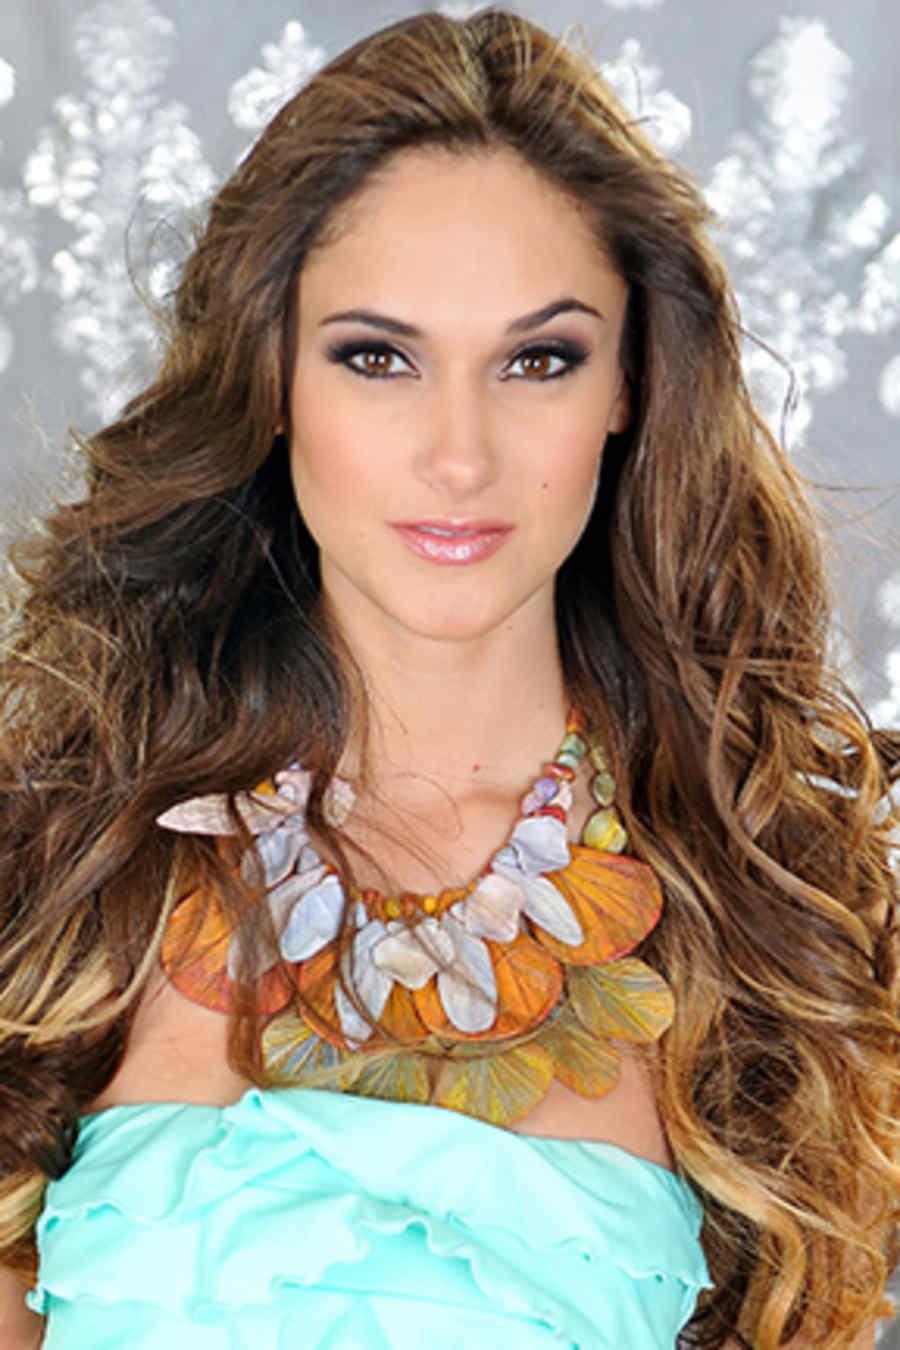 Miss Internacional Guatemala 2014 Miss Guatemala 2014